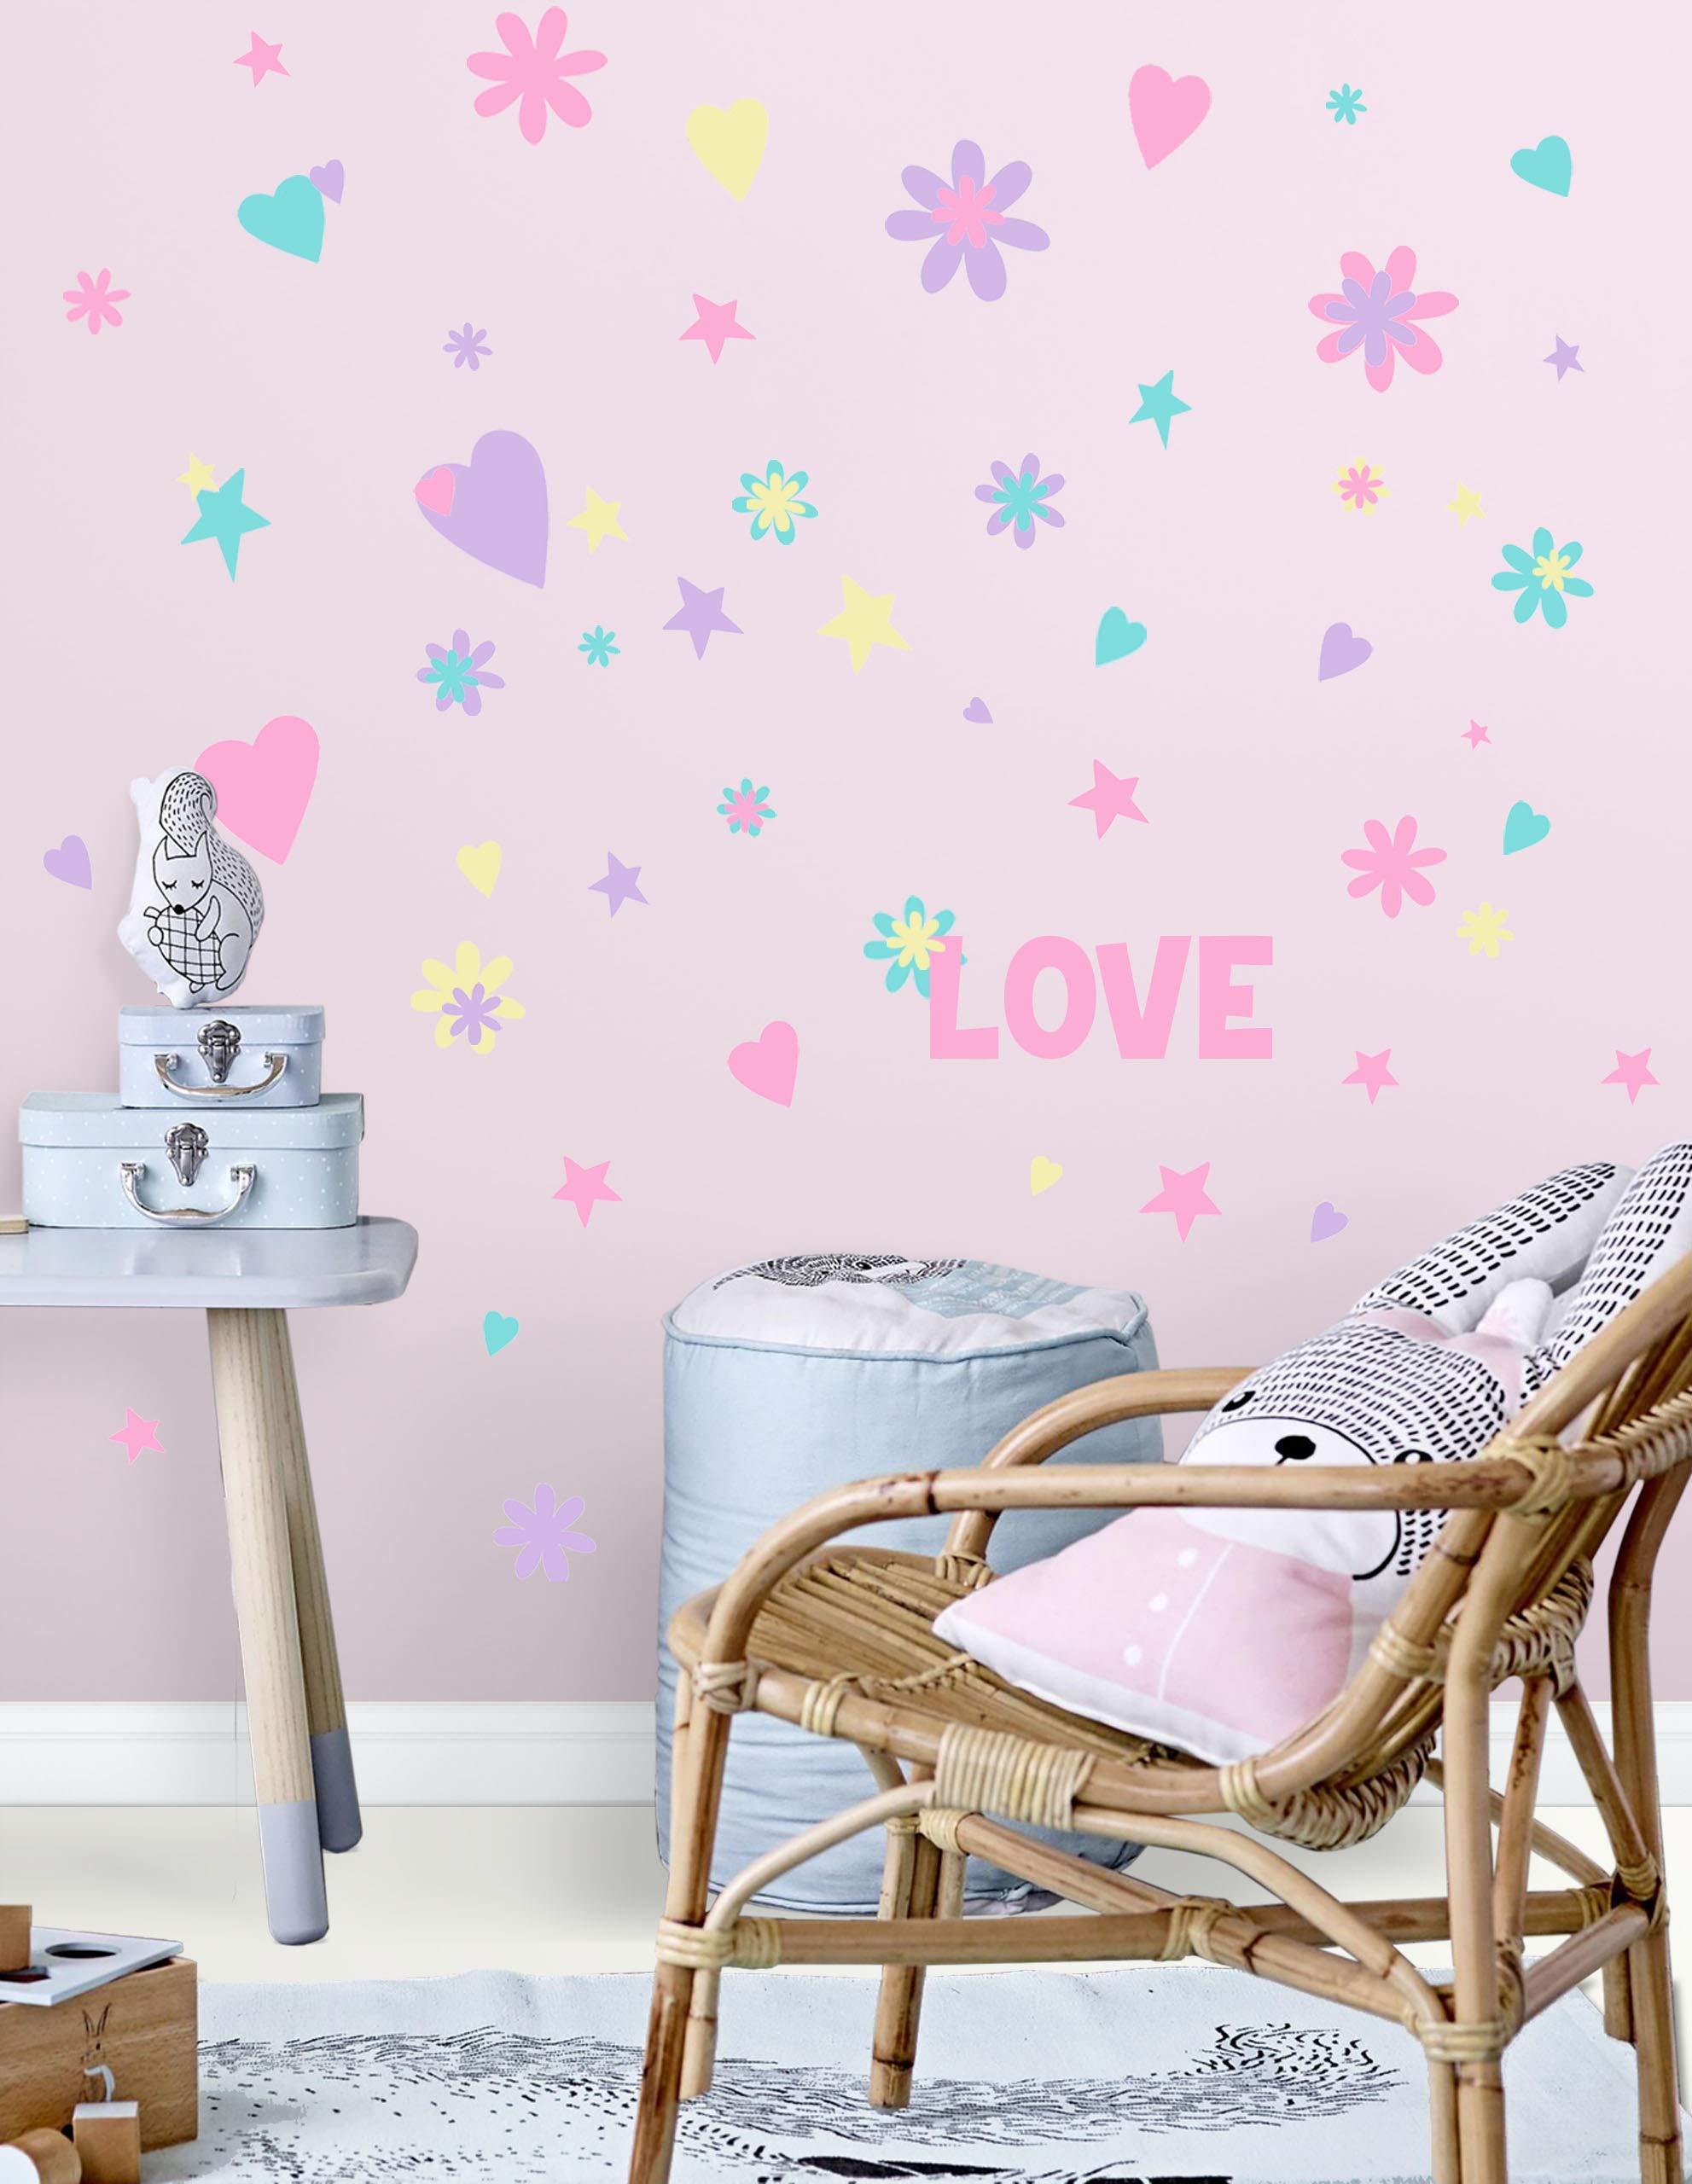 Create-A-Mural Love Word Flowers, Hearts, Stars Wall Decals for Girls Rooms (136) Kids Room Decor Stickers, Baby Nursery Toddler, Teen Decorative DIY Bedroom Peel n' Stick Art Mural